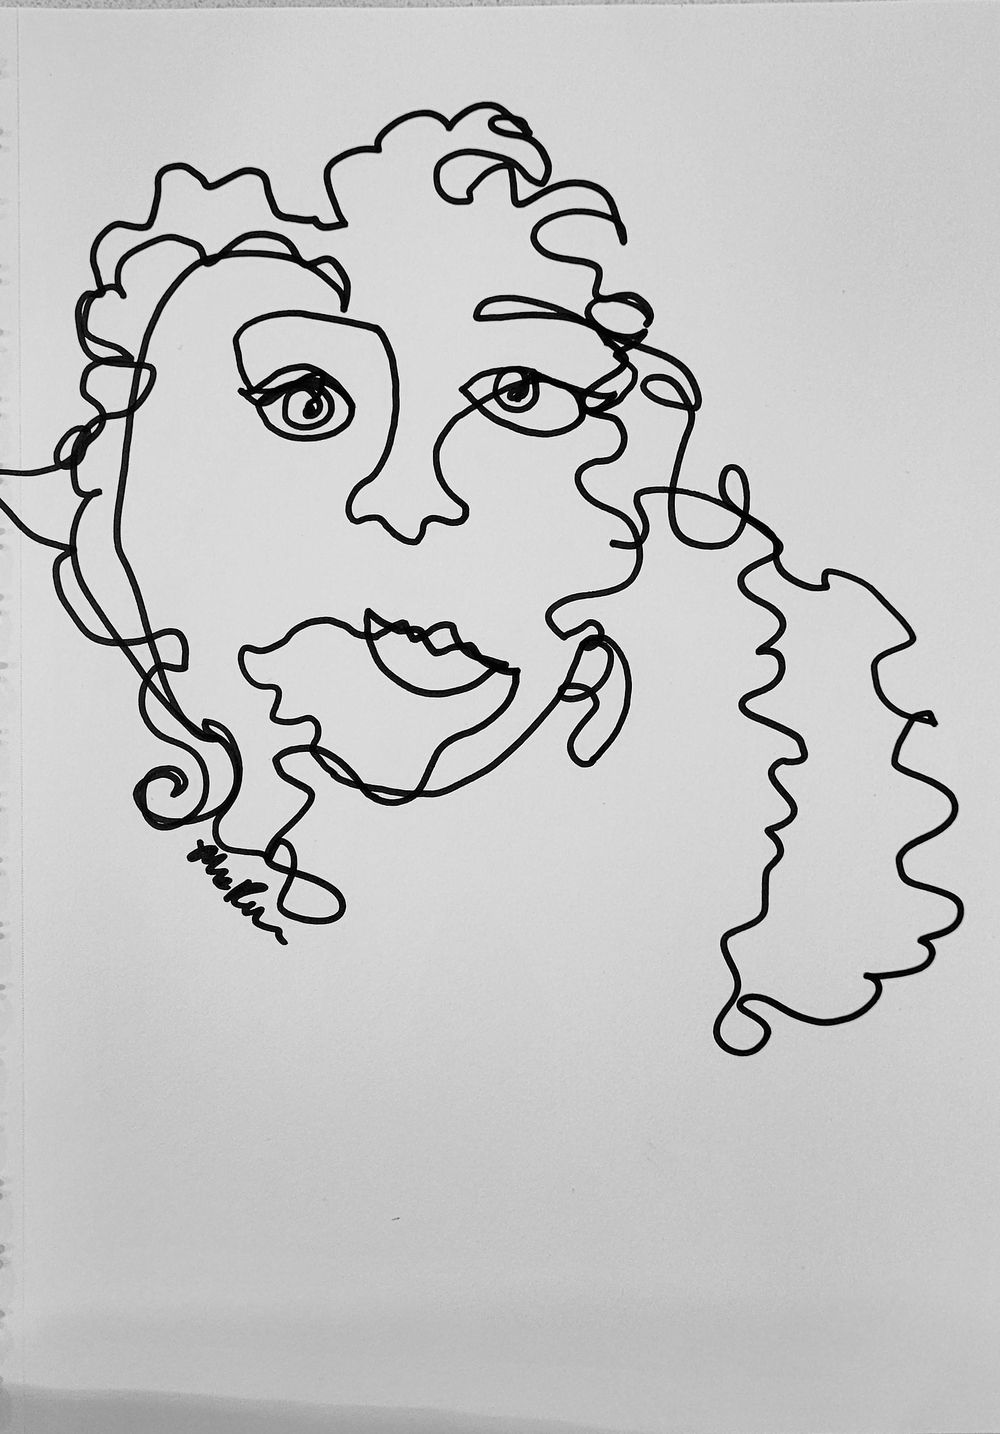 Line Self Portrait - image 3 - student project